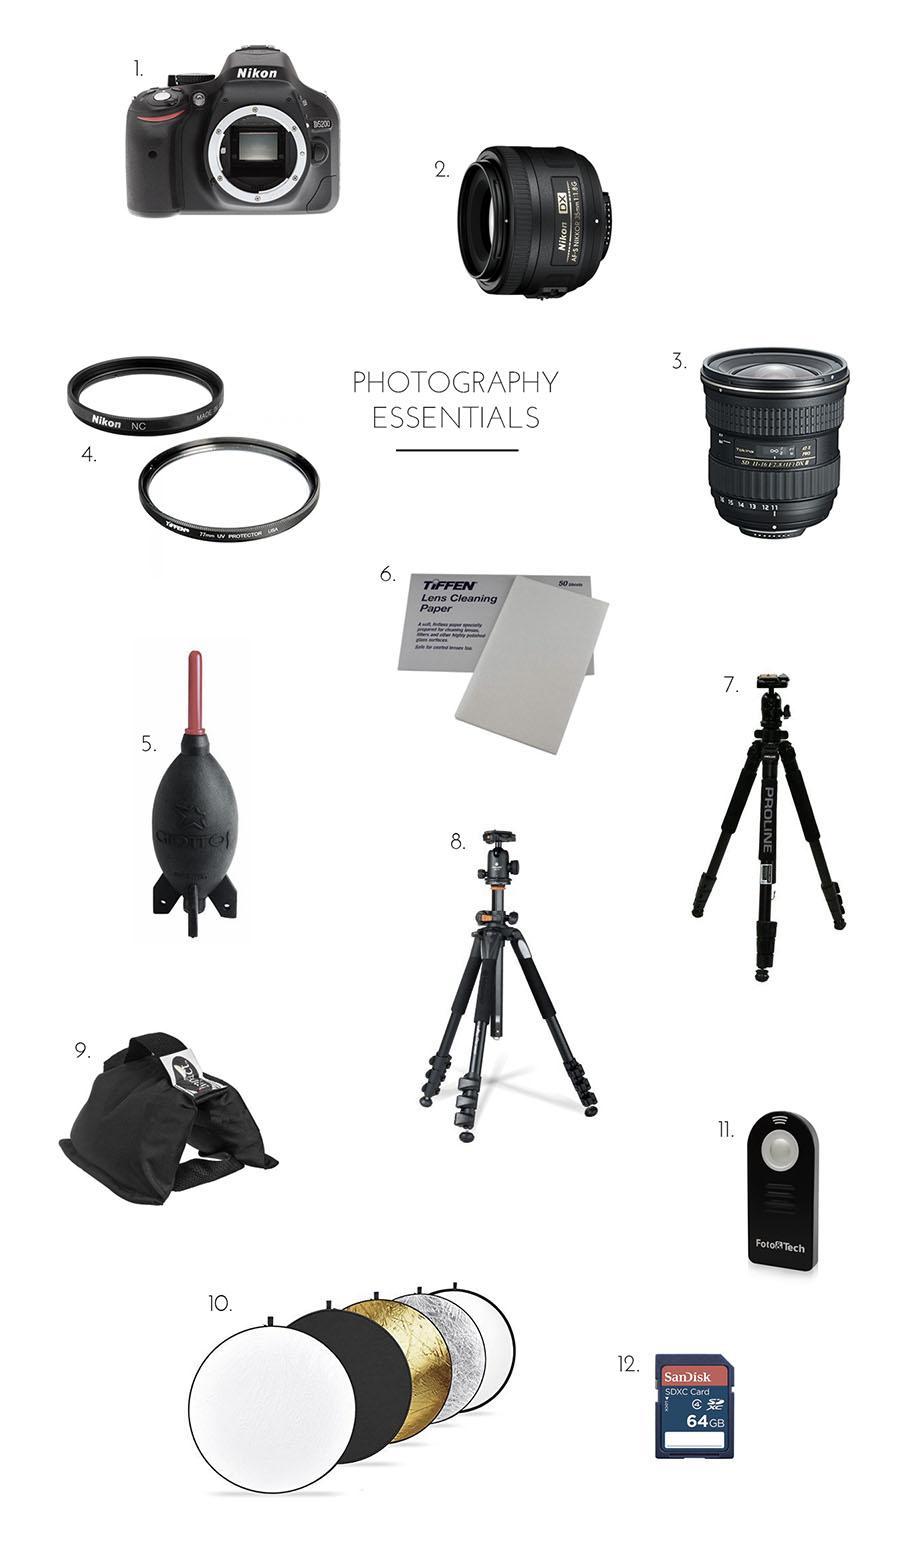 photography essentials